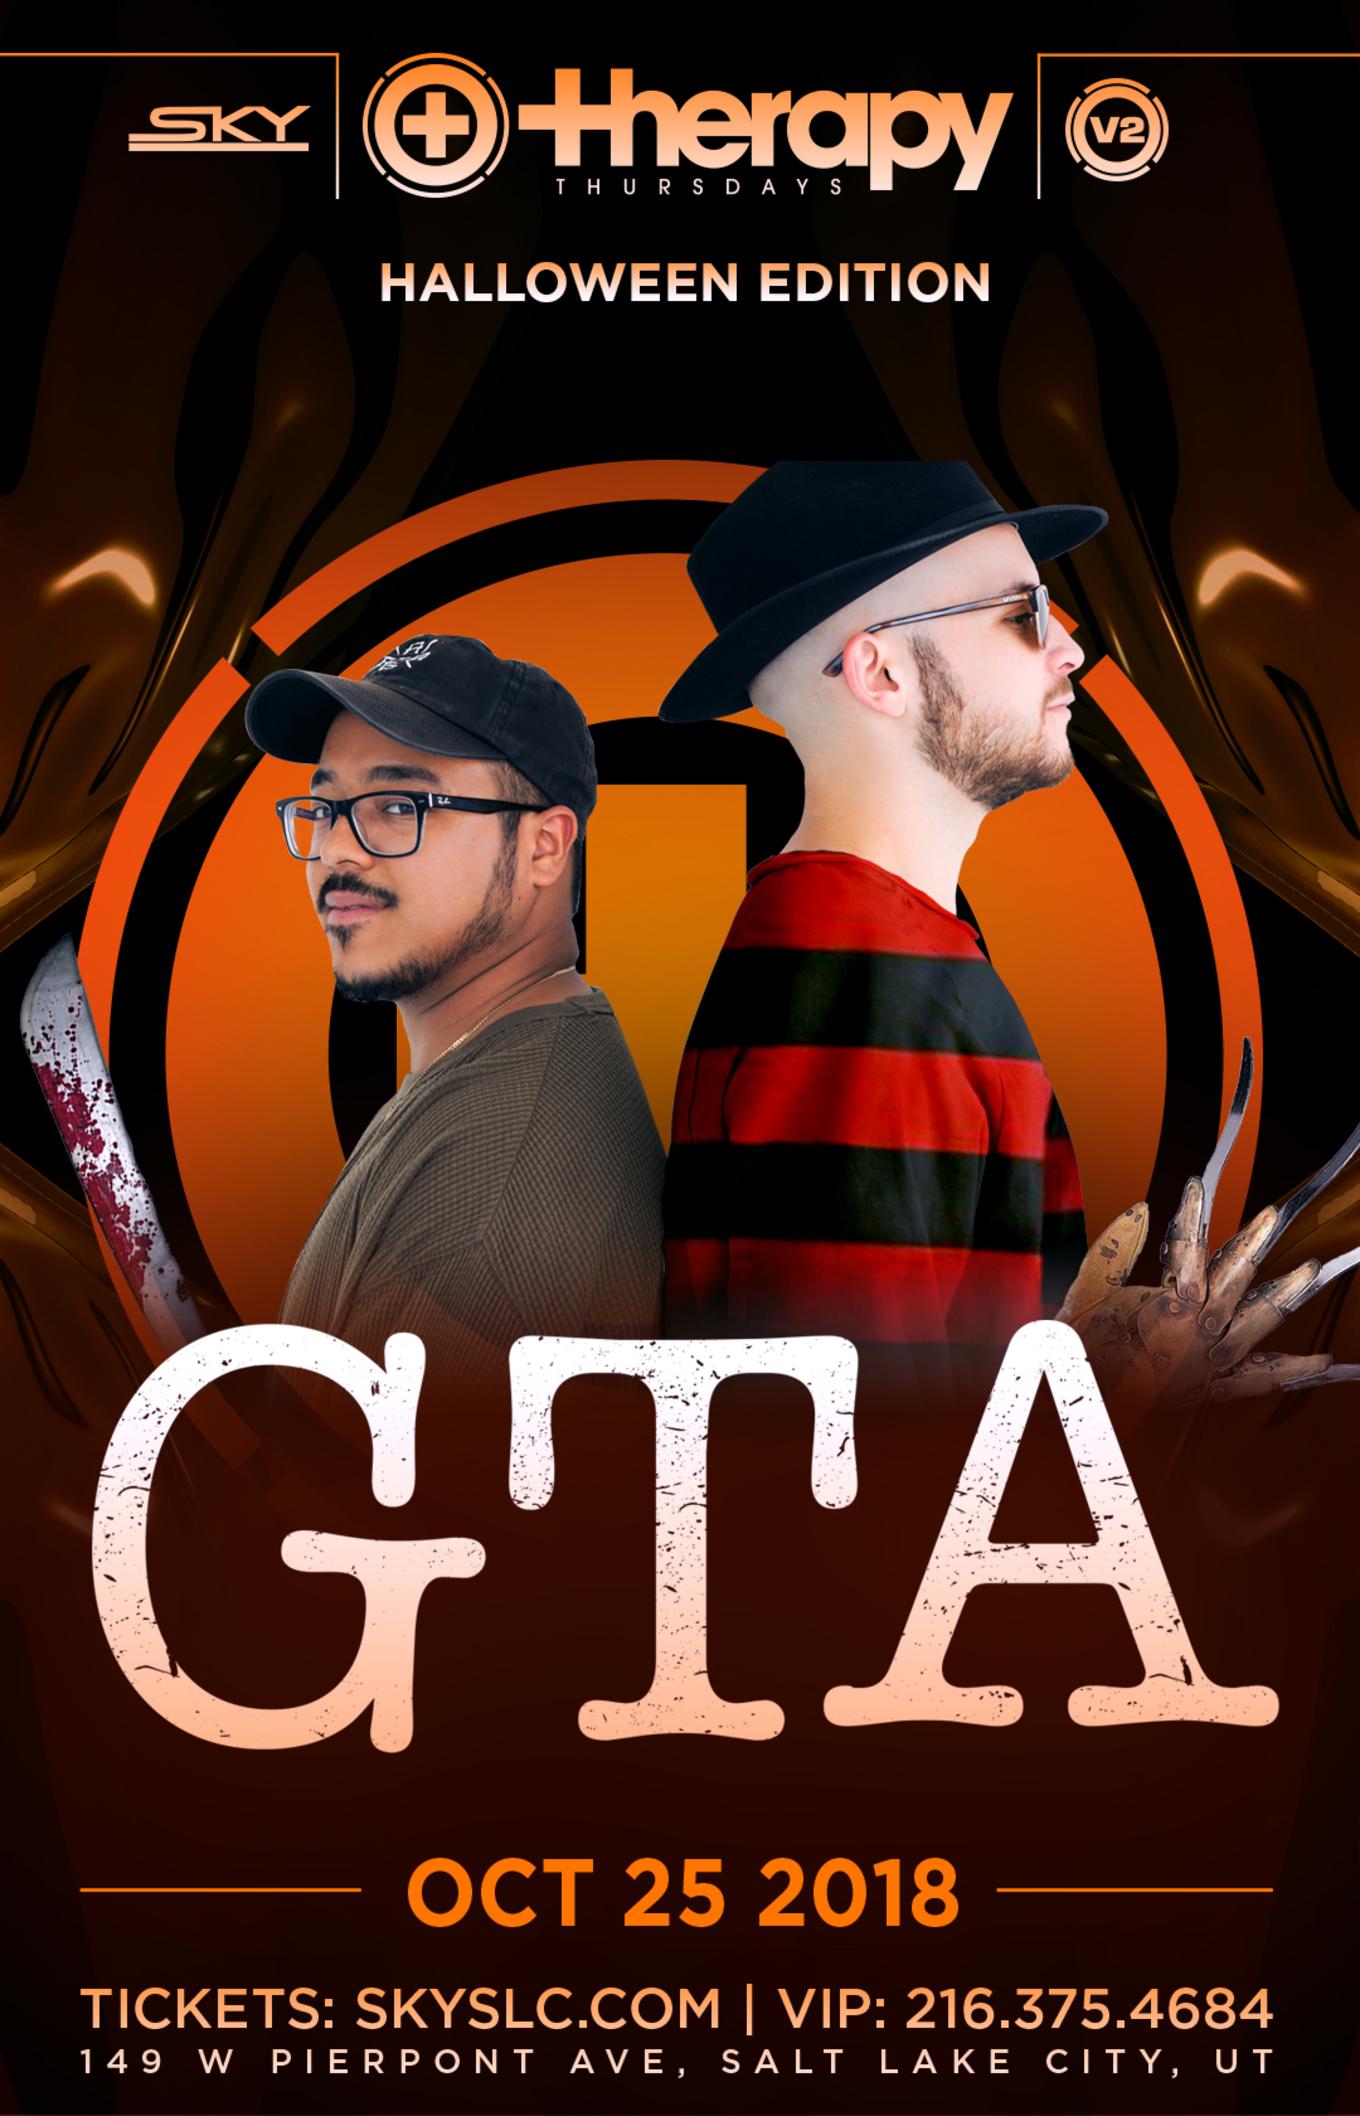 Therapy Thursdays : GTA - Tickets - Sky SLC, Salt Lake City